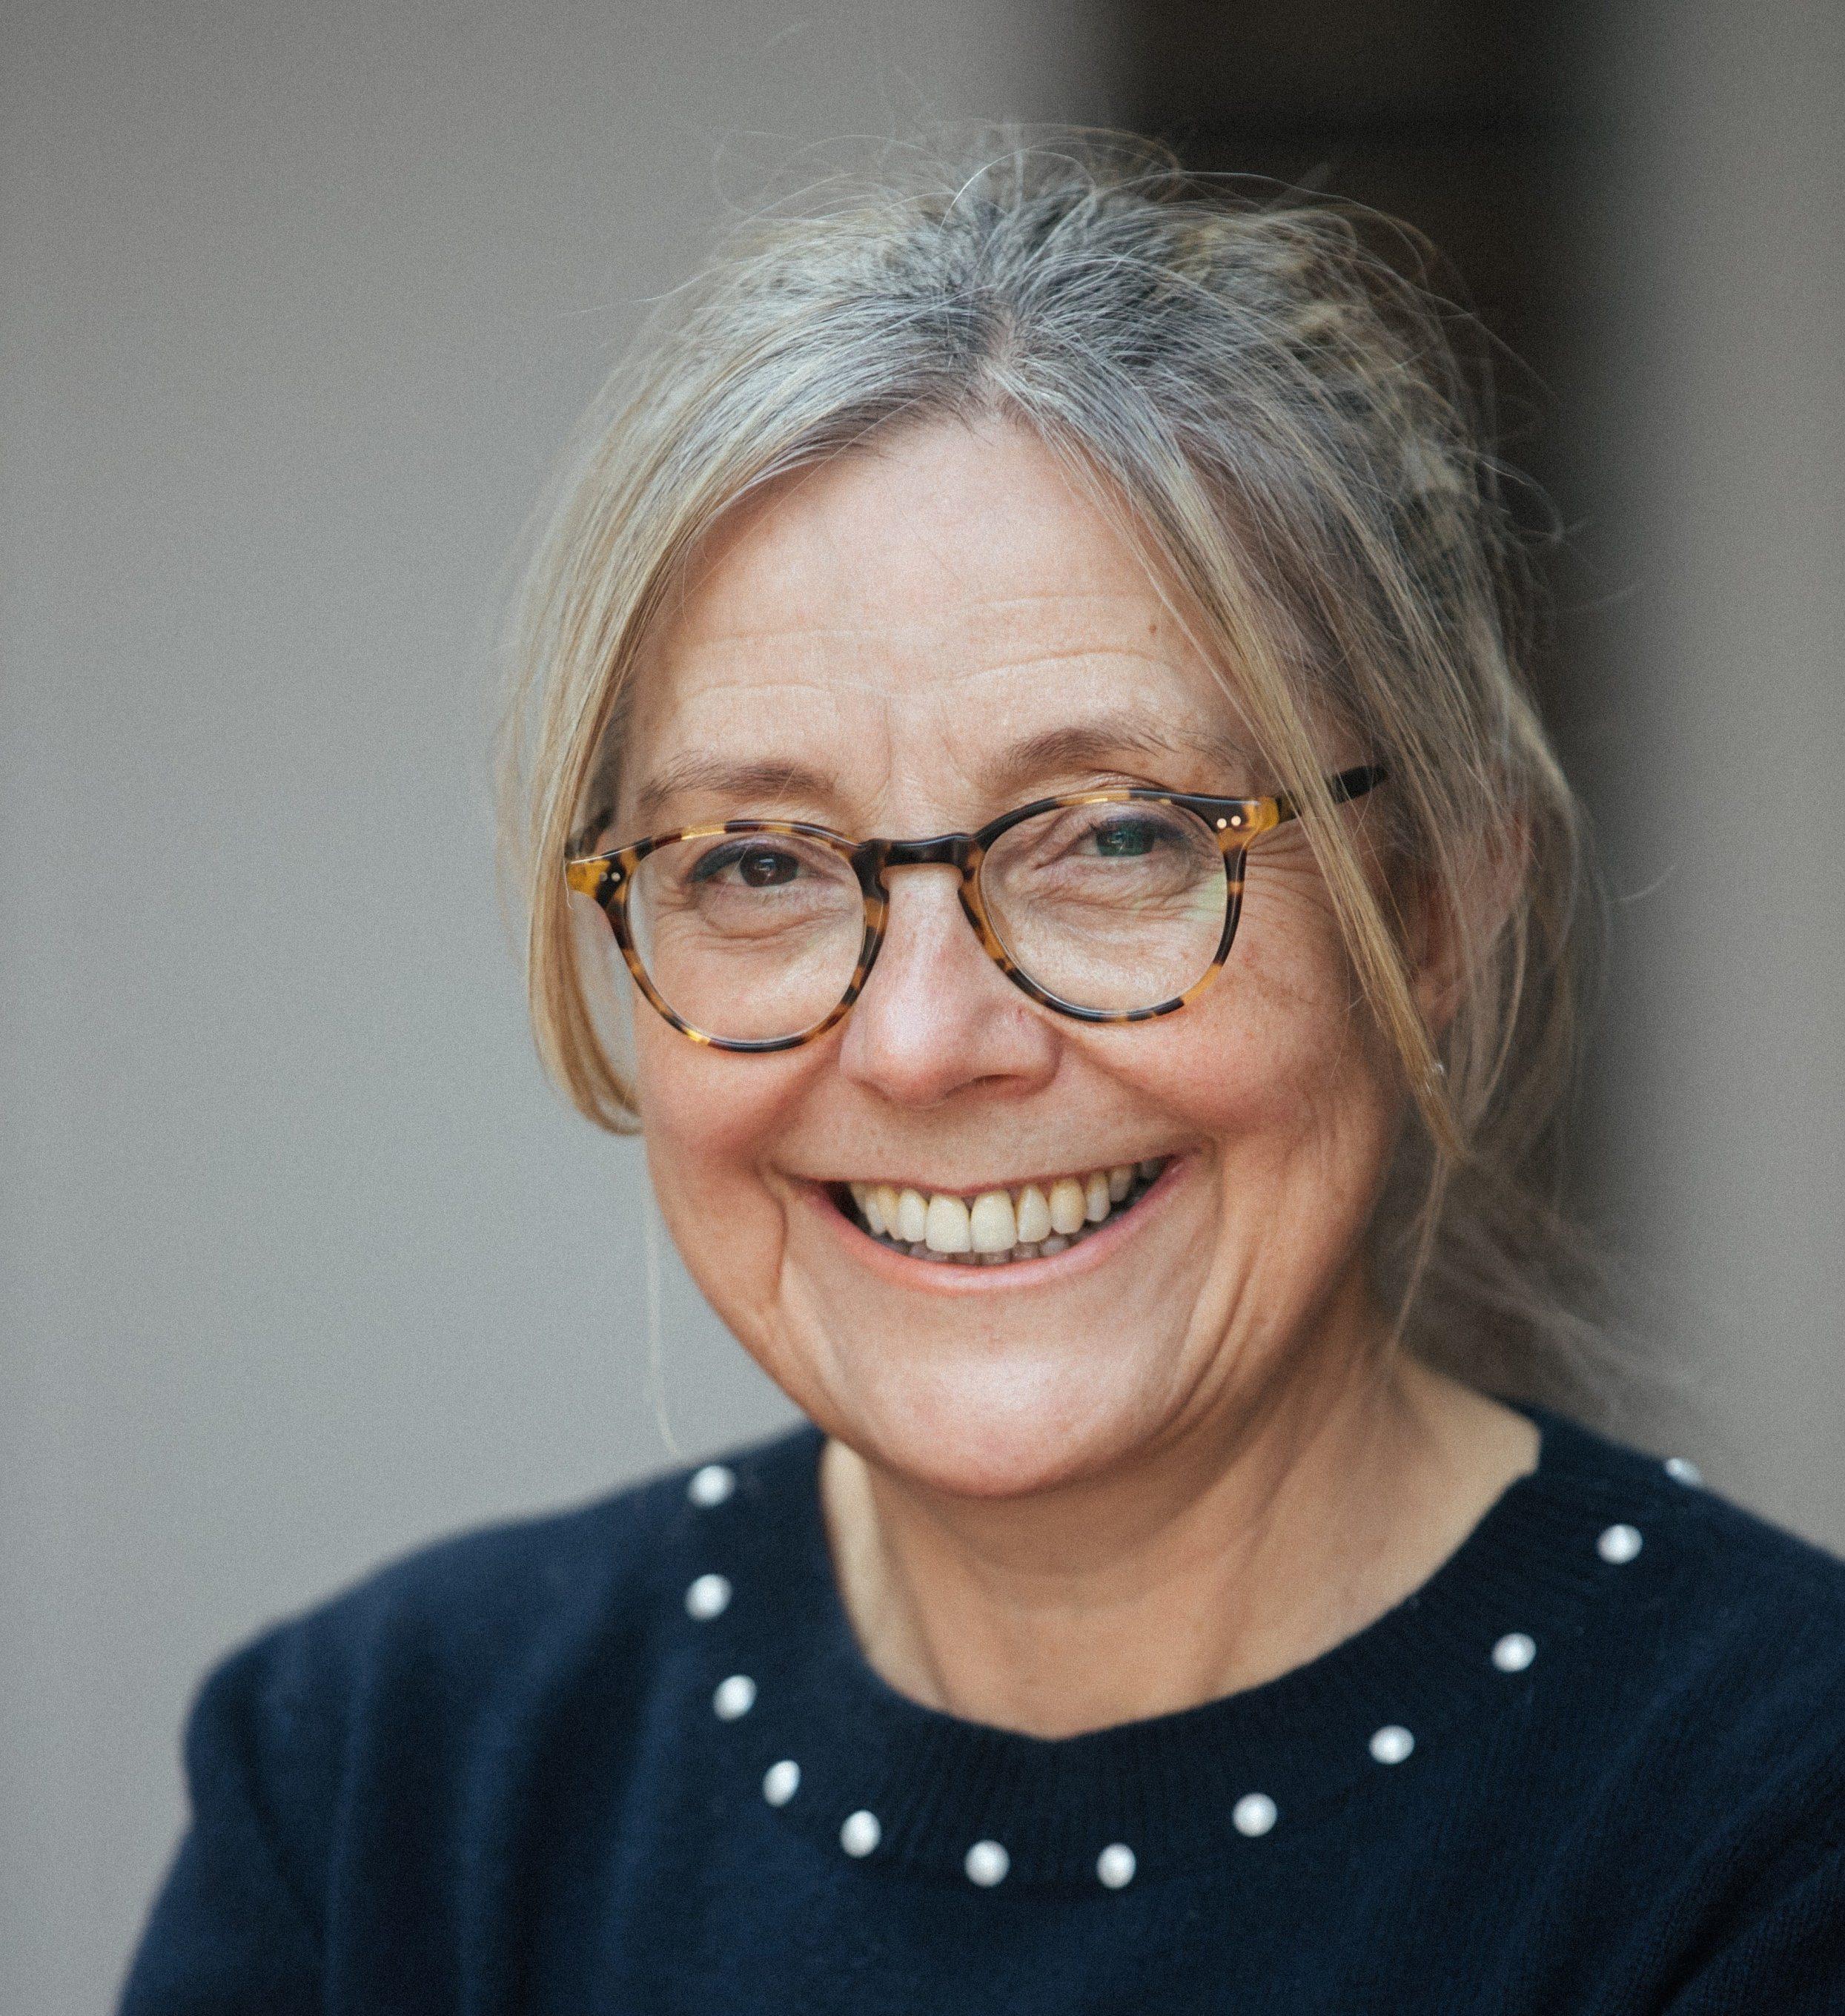 Kimberley Holden